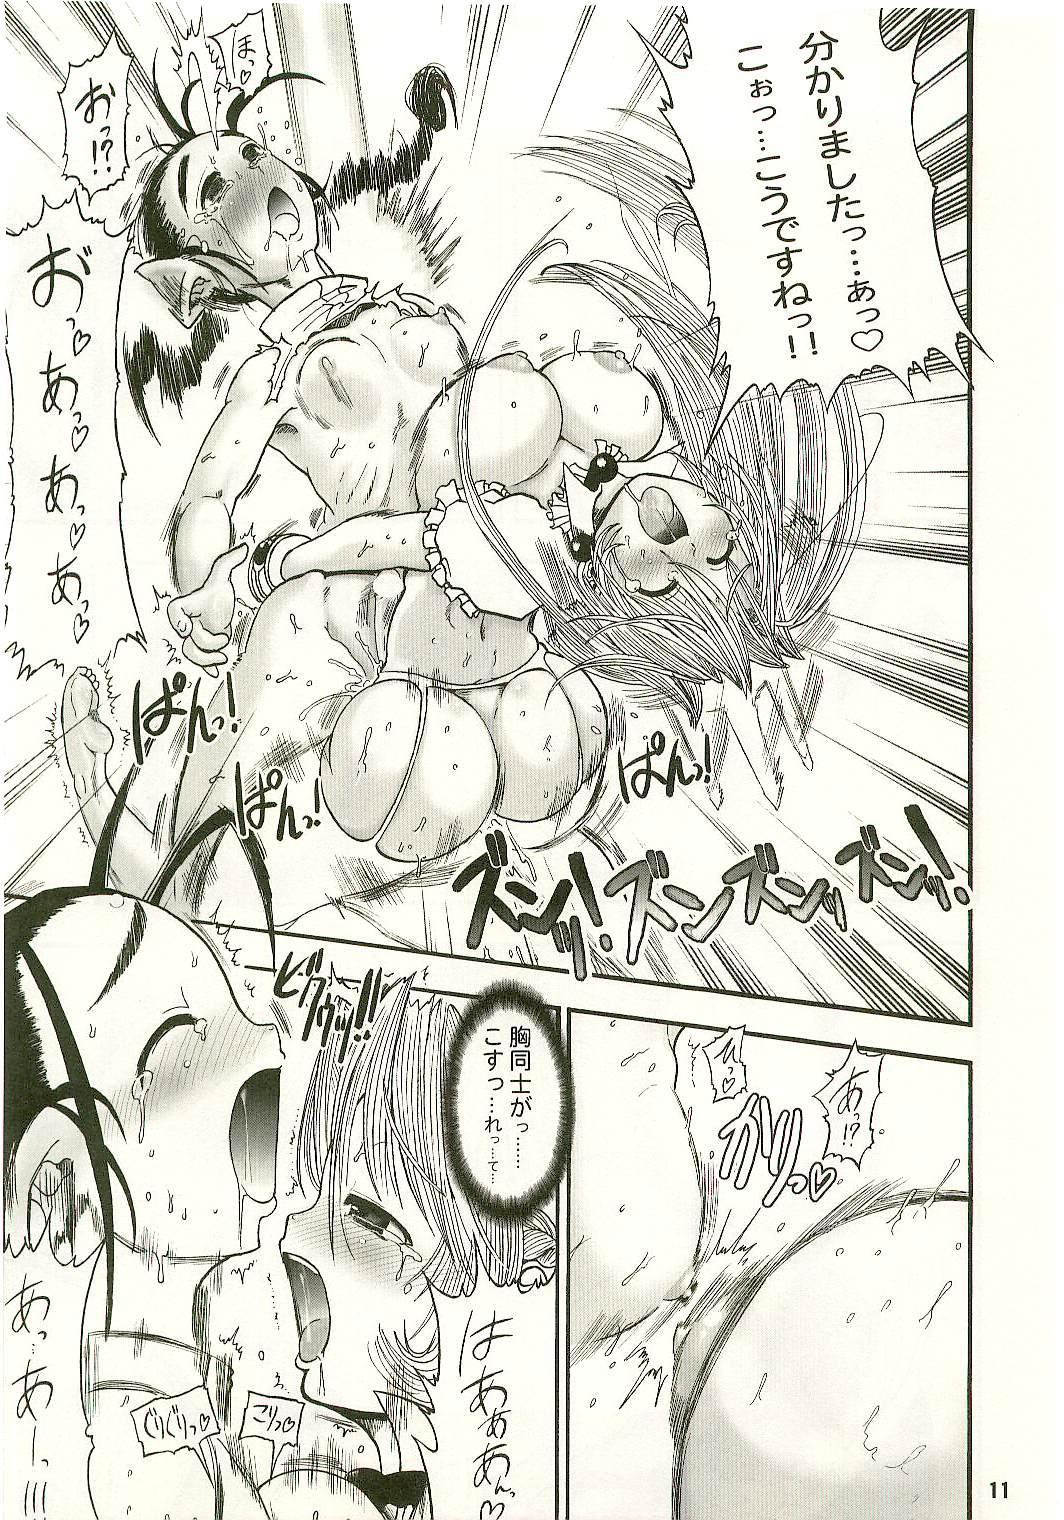 TGWOA Vol.17 - Meikyuu Oujo Prina 3 8